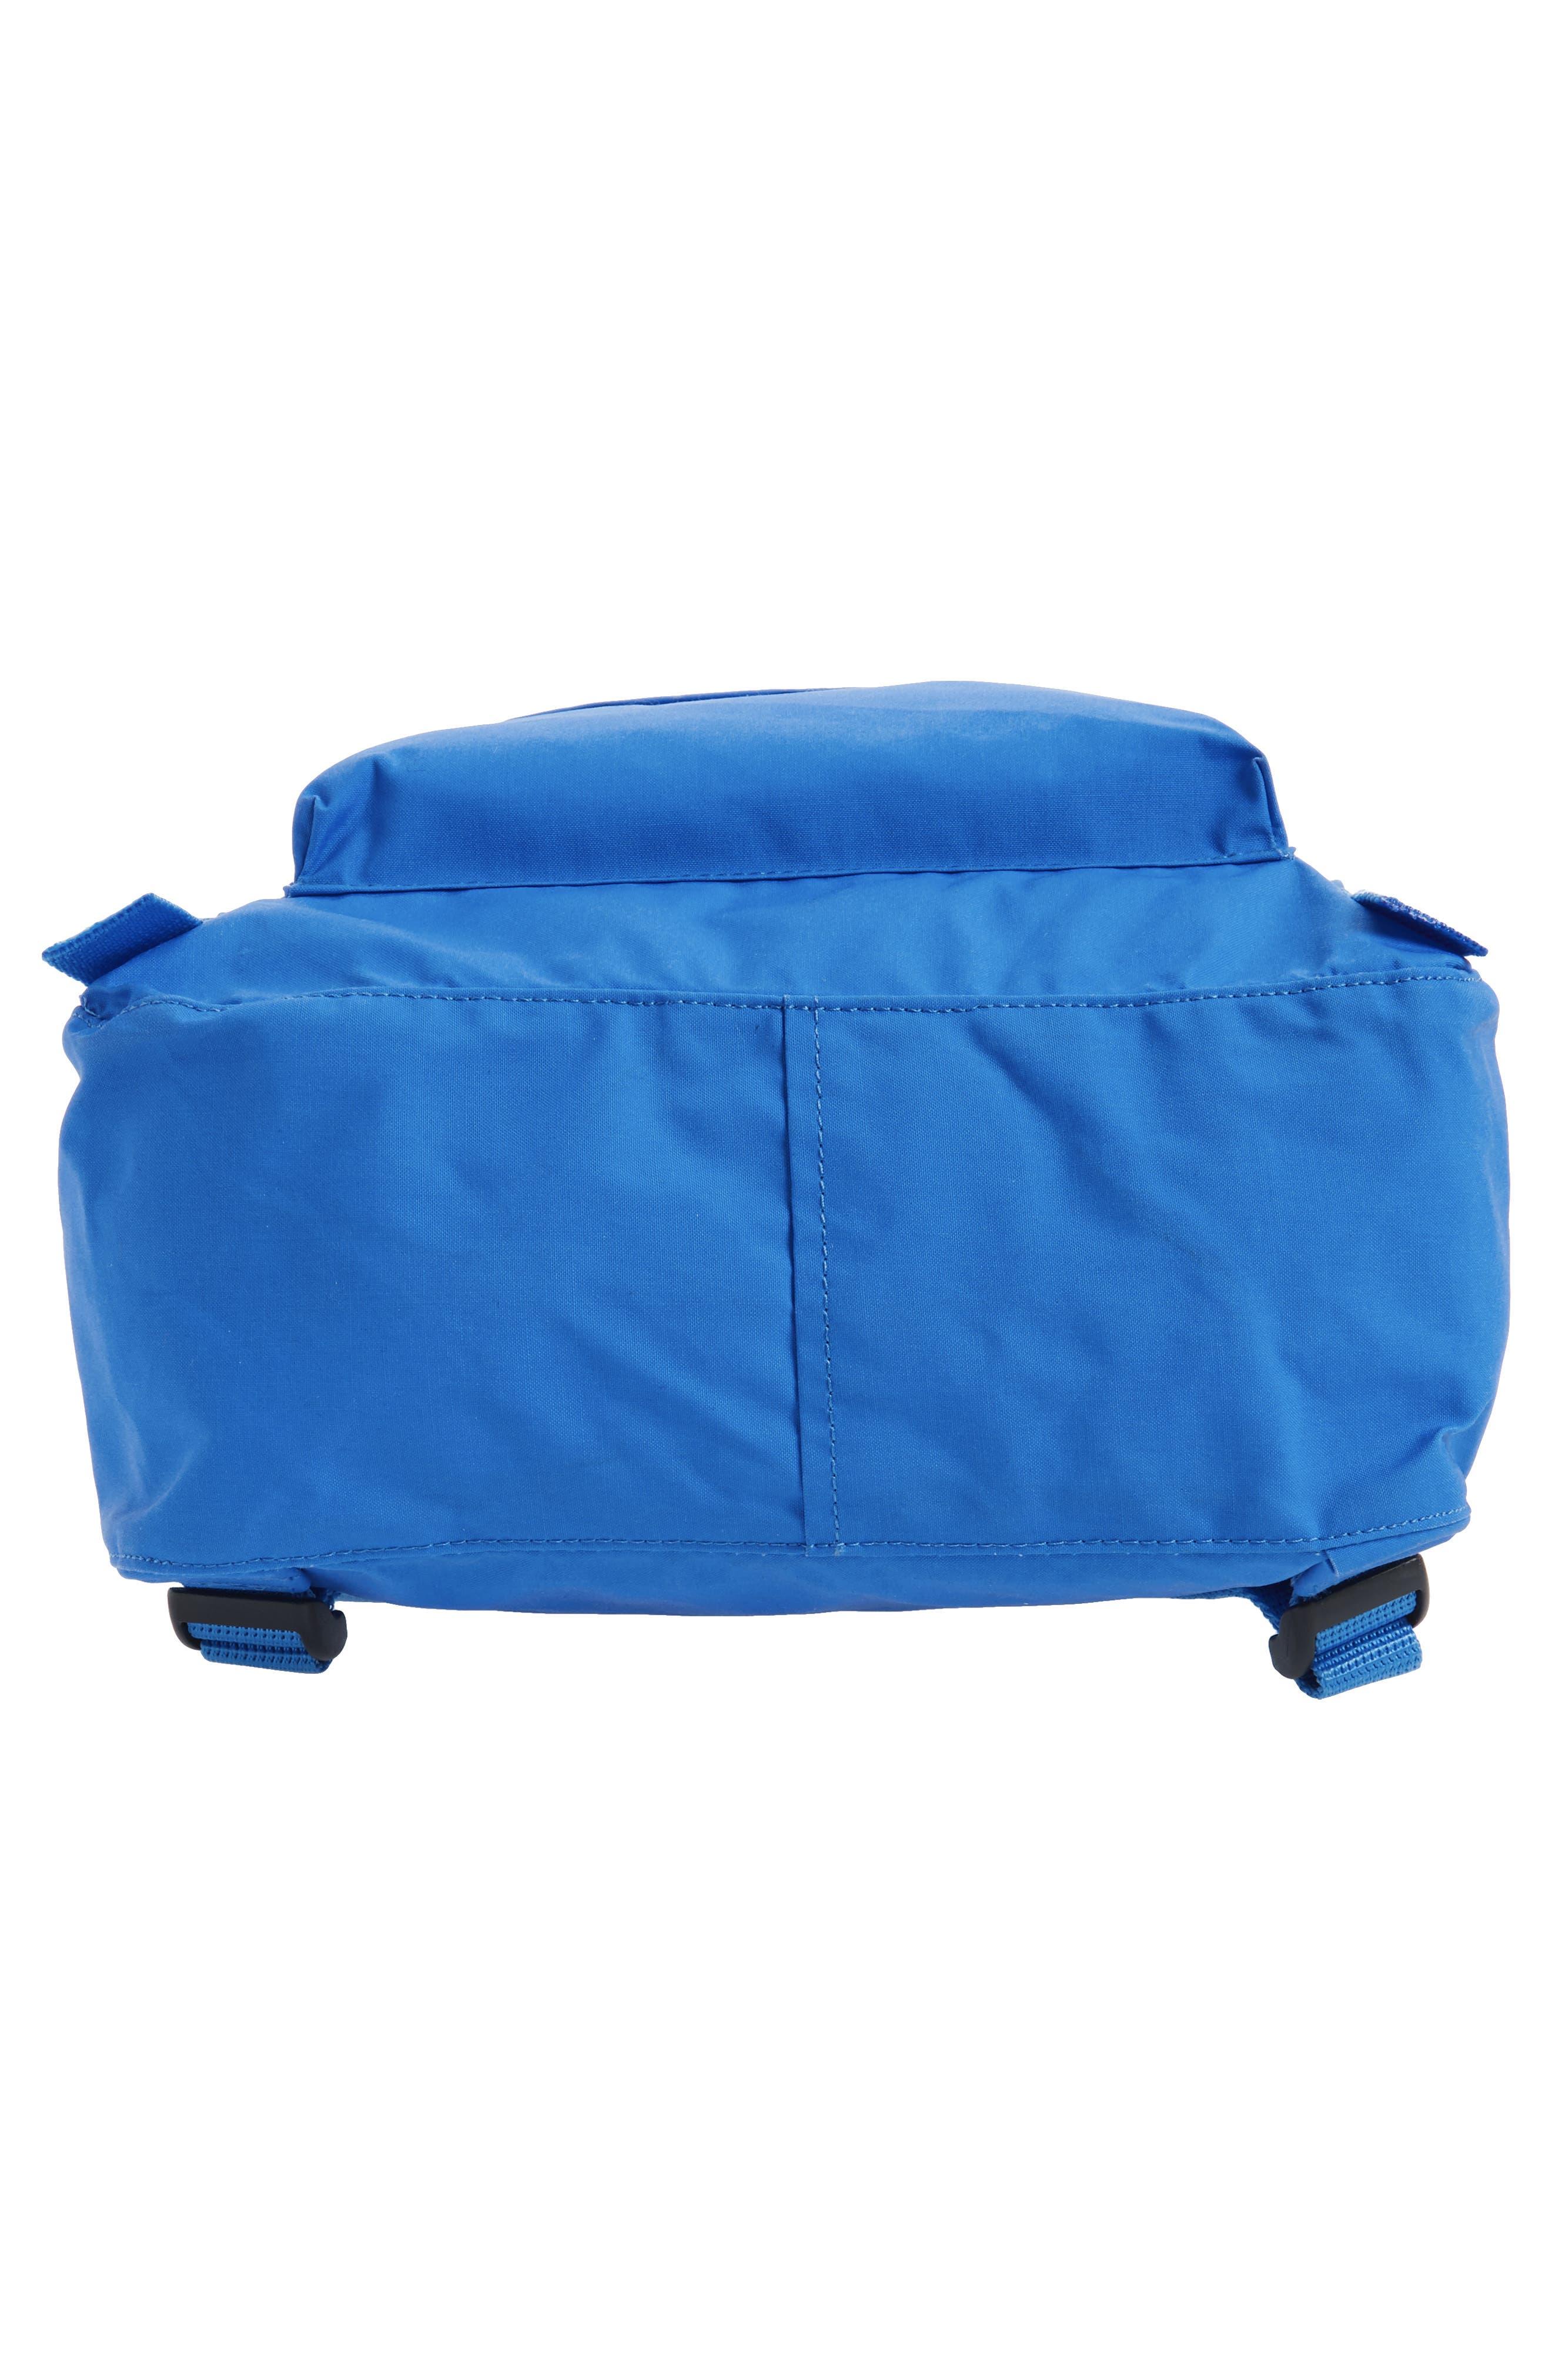 'Kånken' Water Resistant Backpack,                             Alternate thumbnail 333, color,